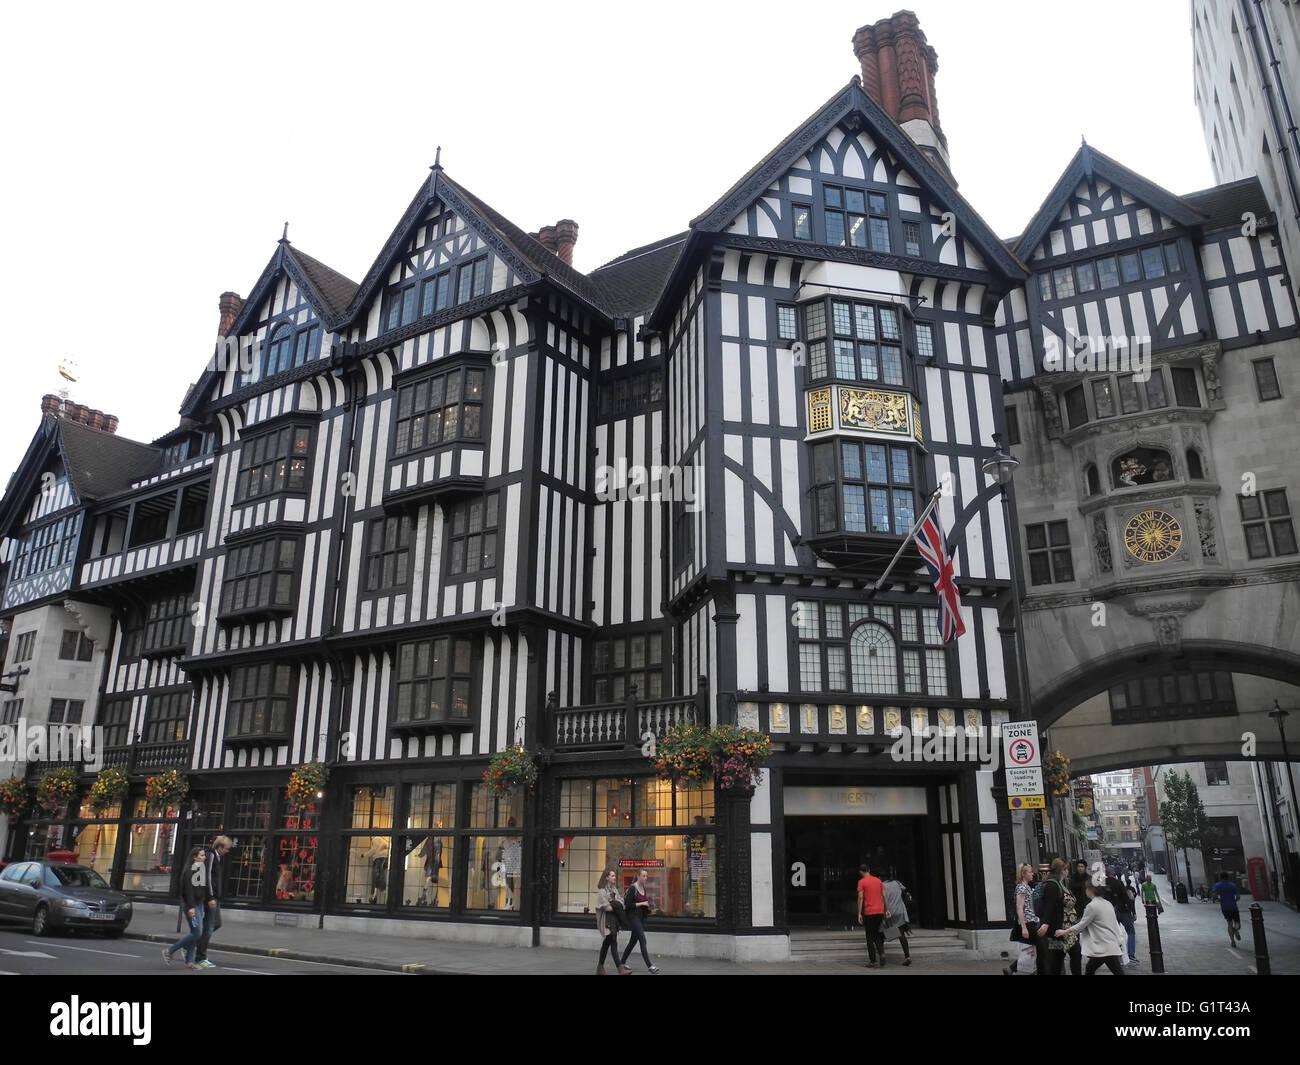 Liberty Department Store, Great Marlborough Street, London, UK - Stock Image